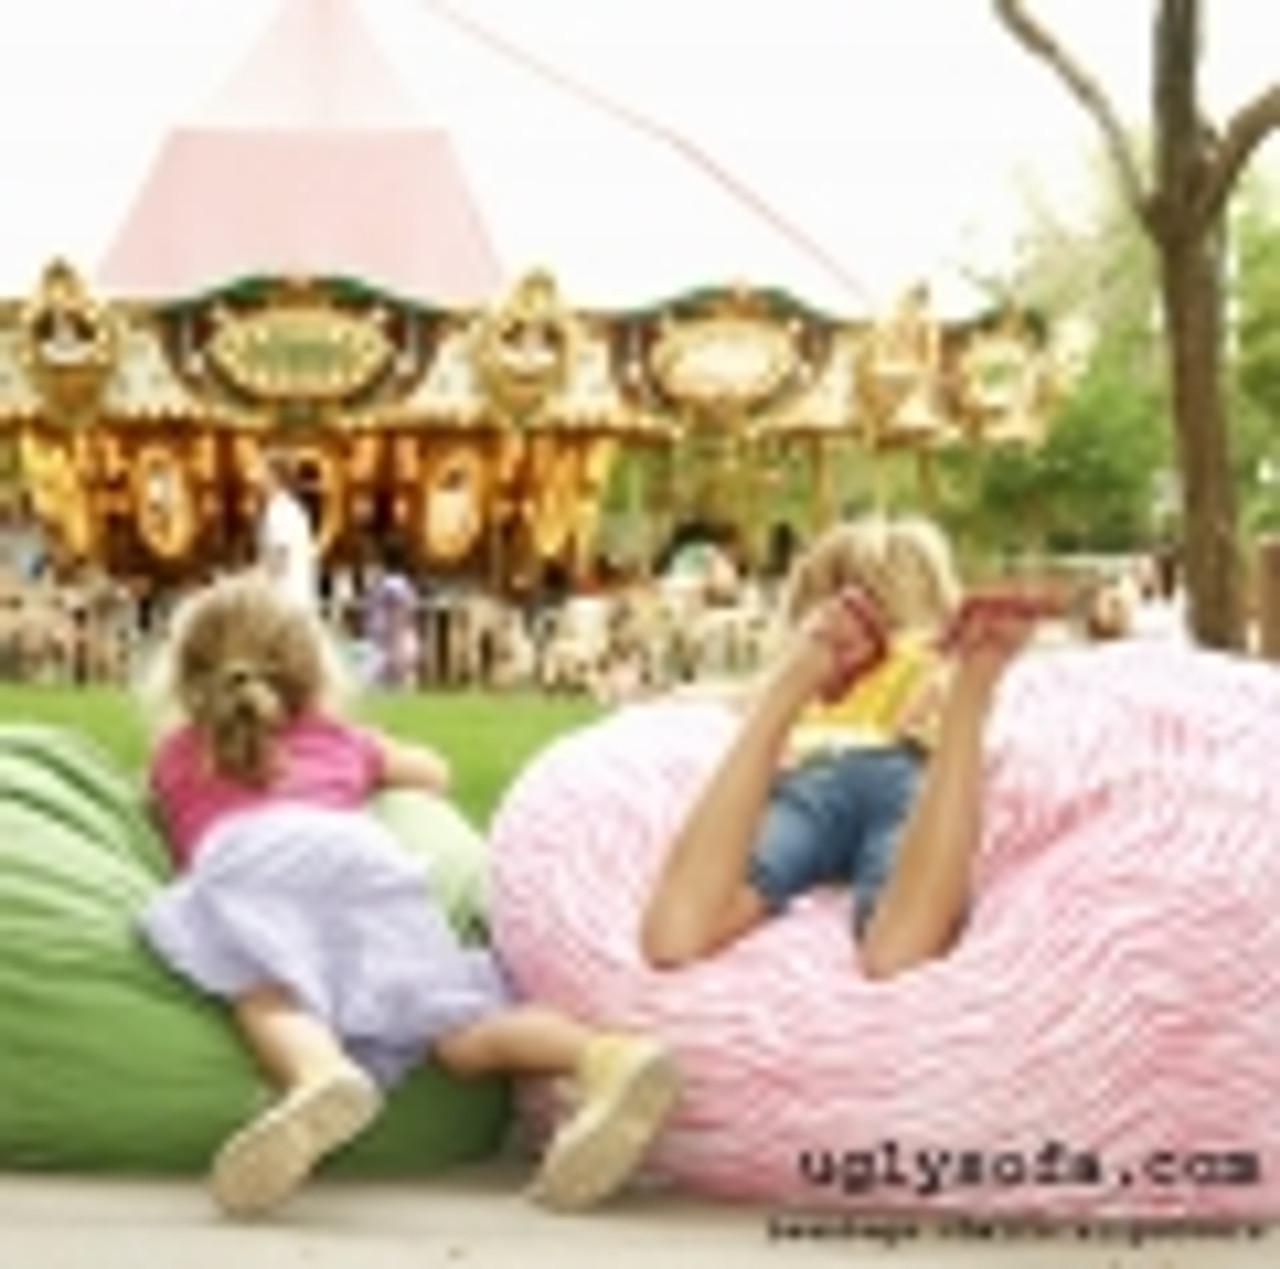 UglySak Bean Bag Chairs